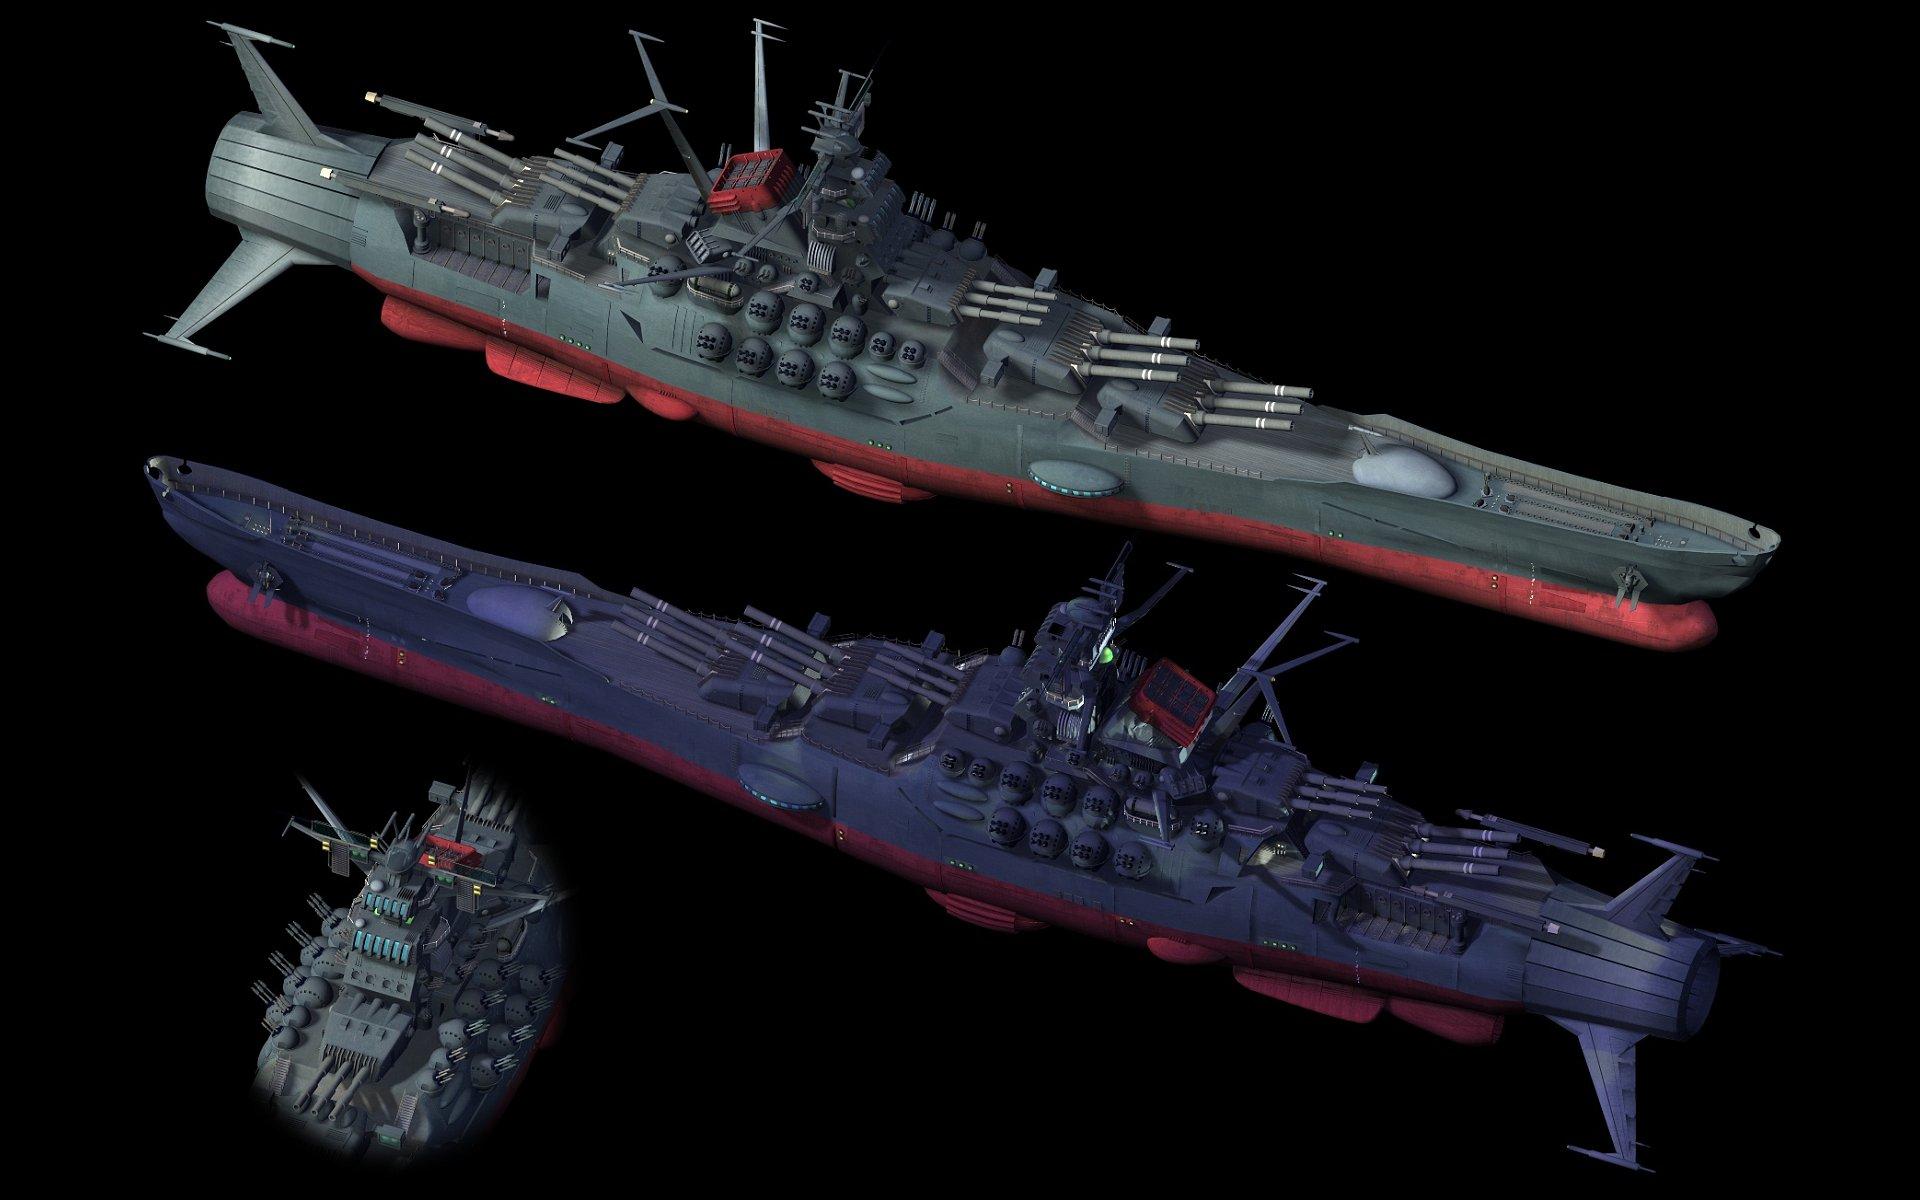 Space Battleship Yamato Concept Art